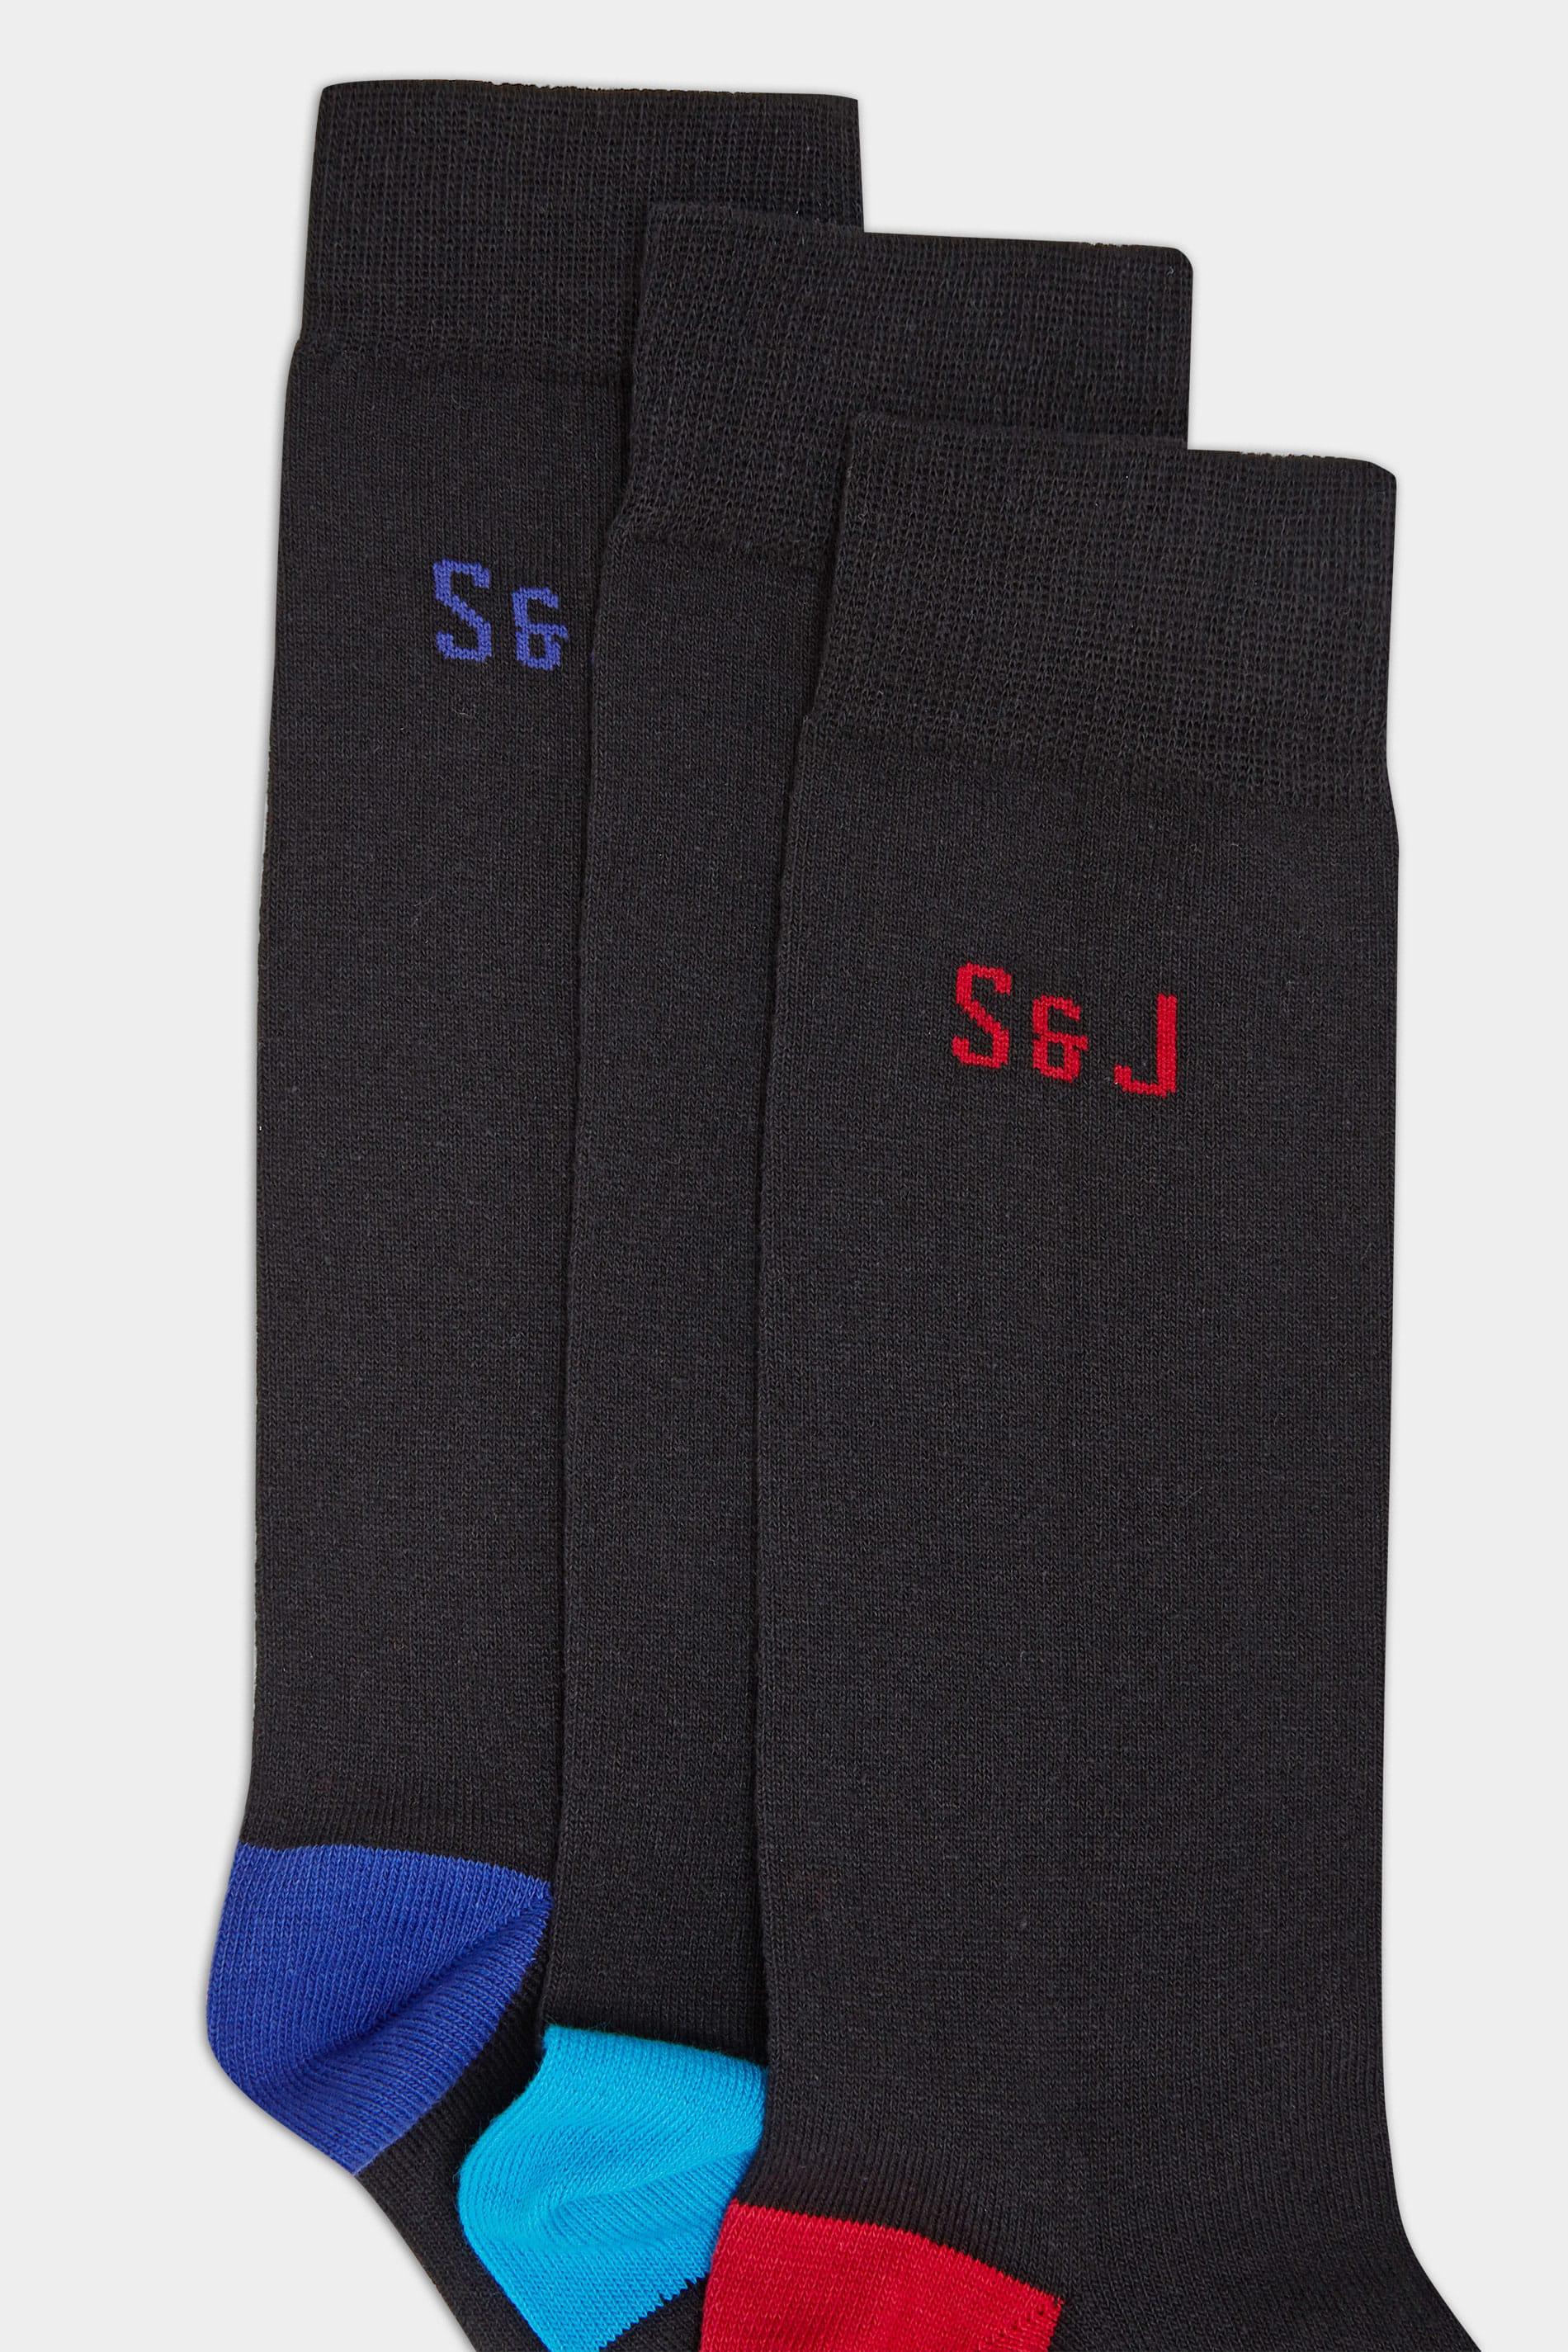 SMITH & JONES 3 PACK Black Branded Socks